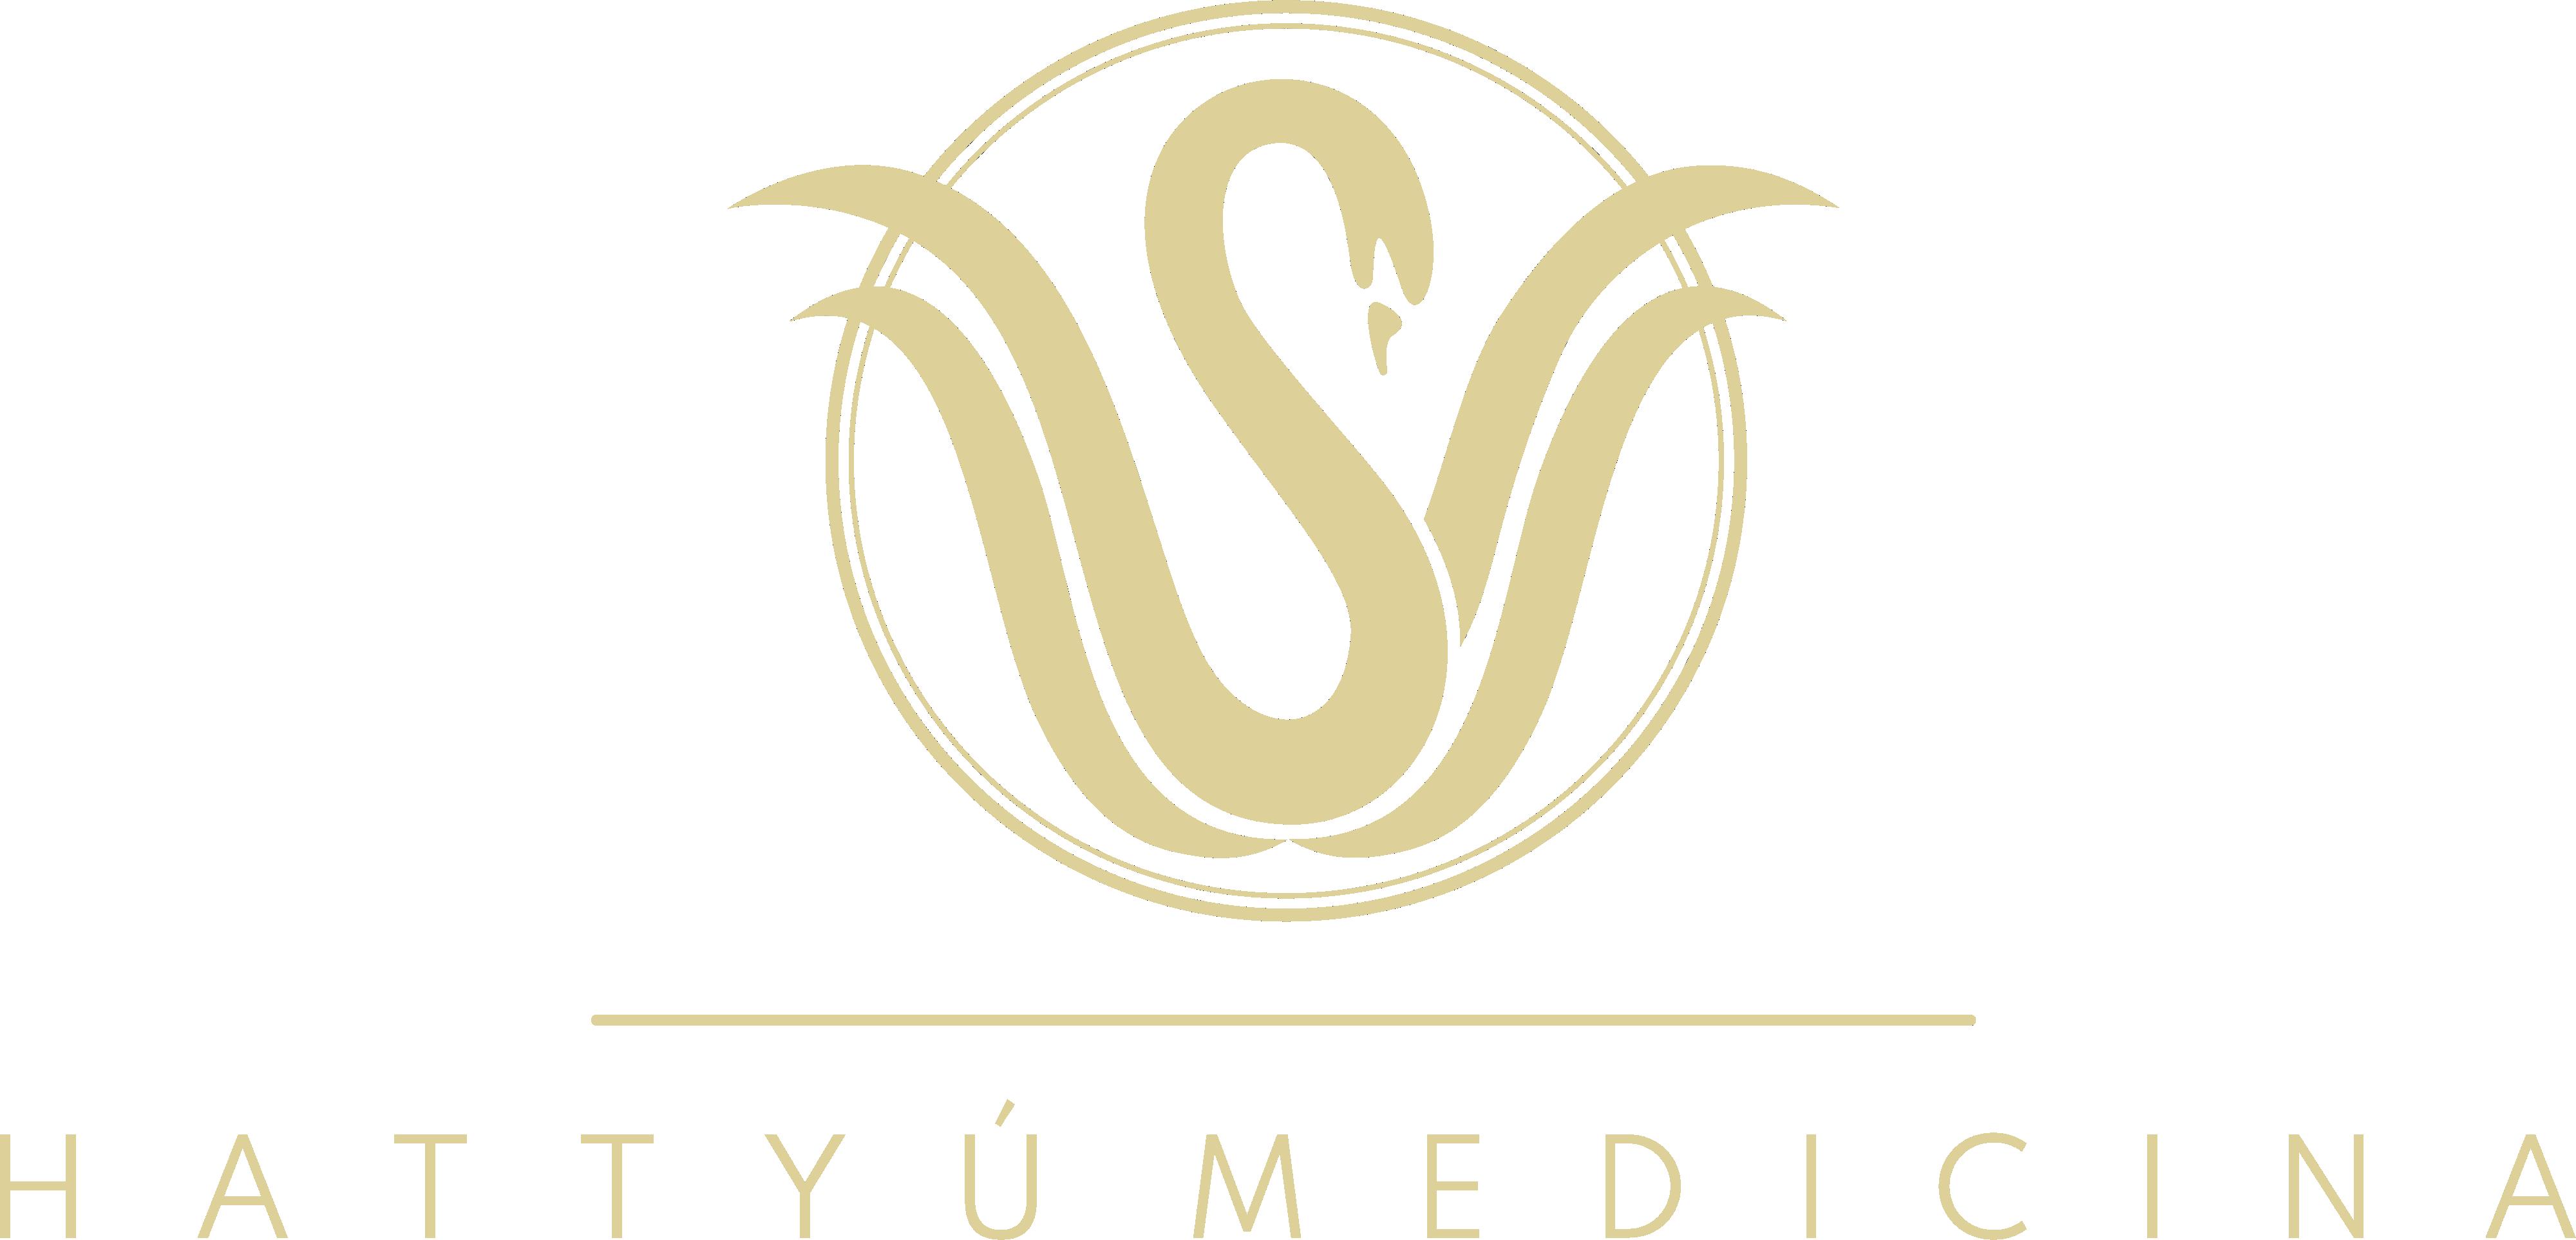 Hattyú Medicina logó